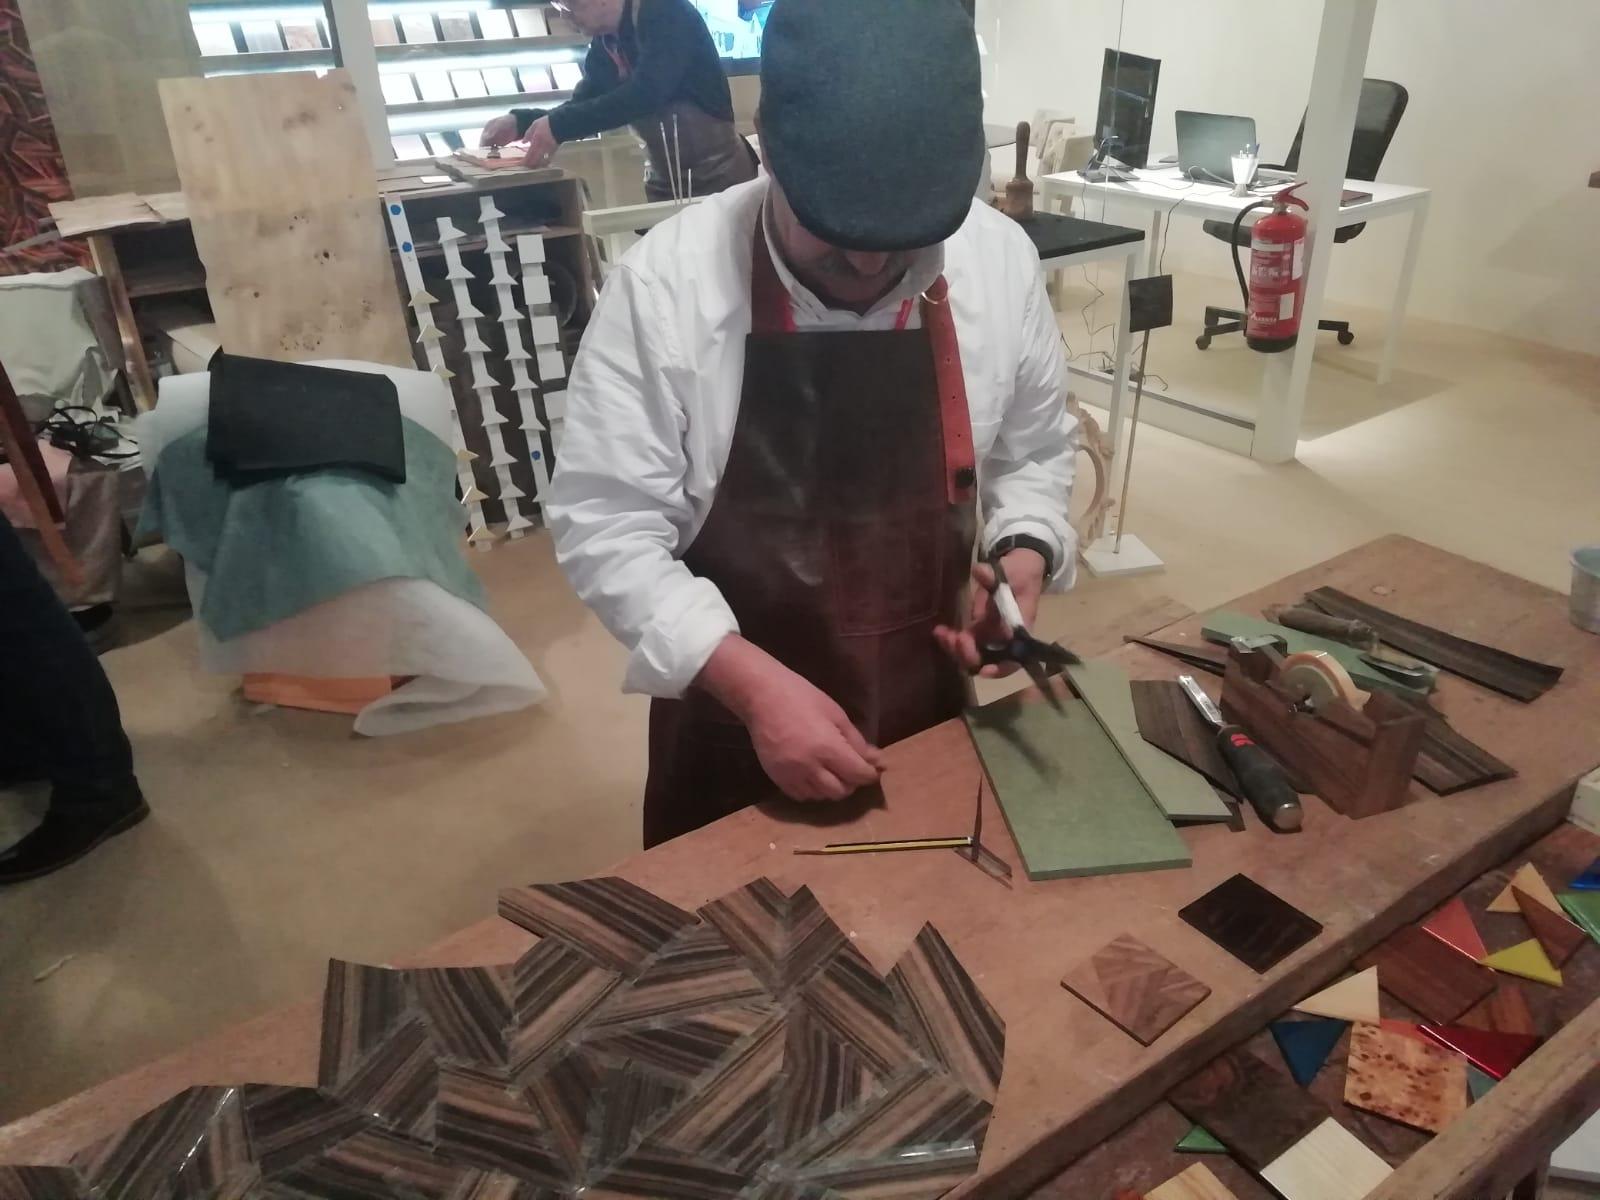 Master Artisans and Craftsmanship at Maison et Objet 2019 Maison et Objet 2019 Highlights of Maison et Objet 2019 Mr Cosme Master Artisan in wood working   Preggo Group